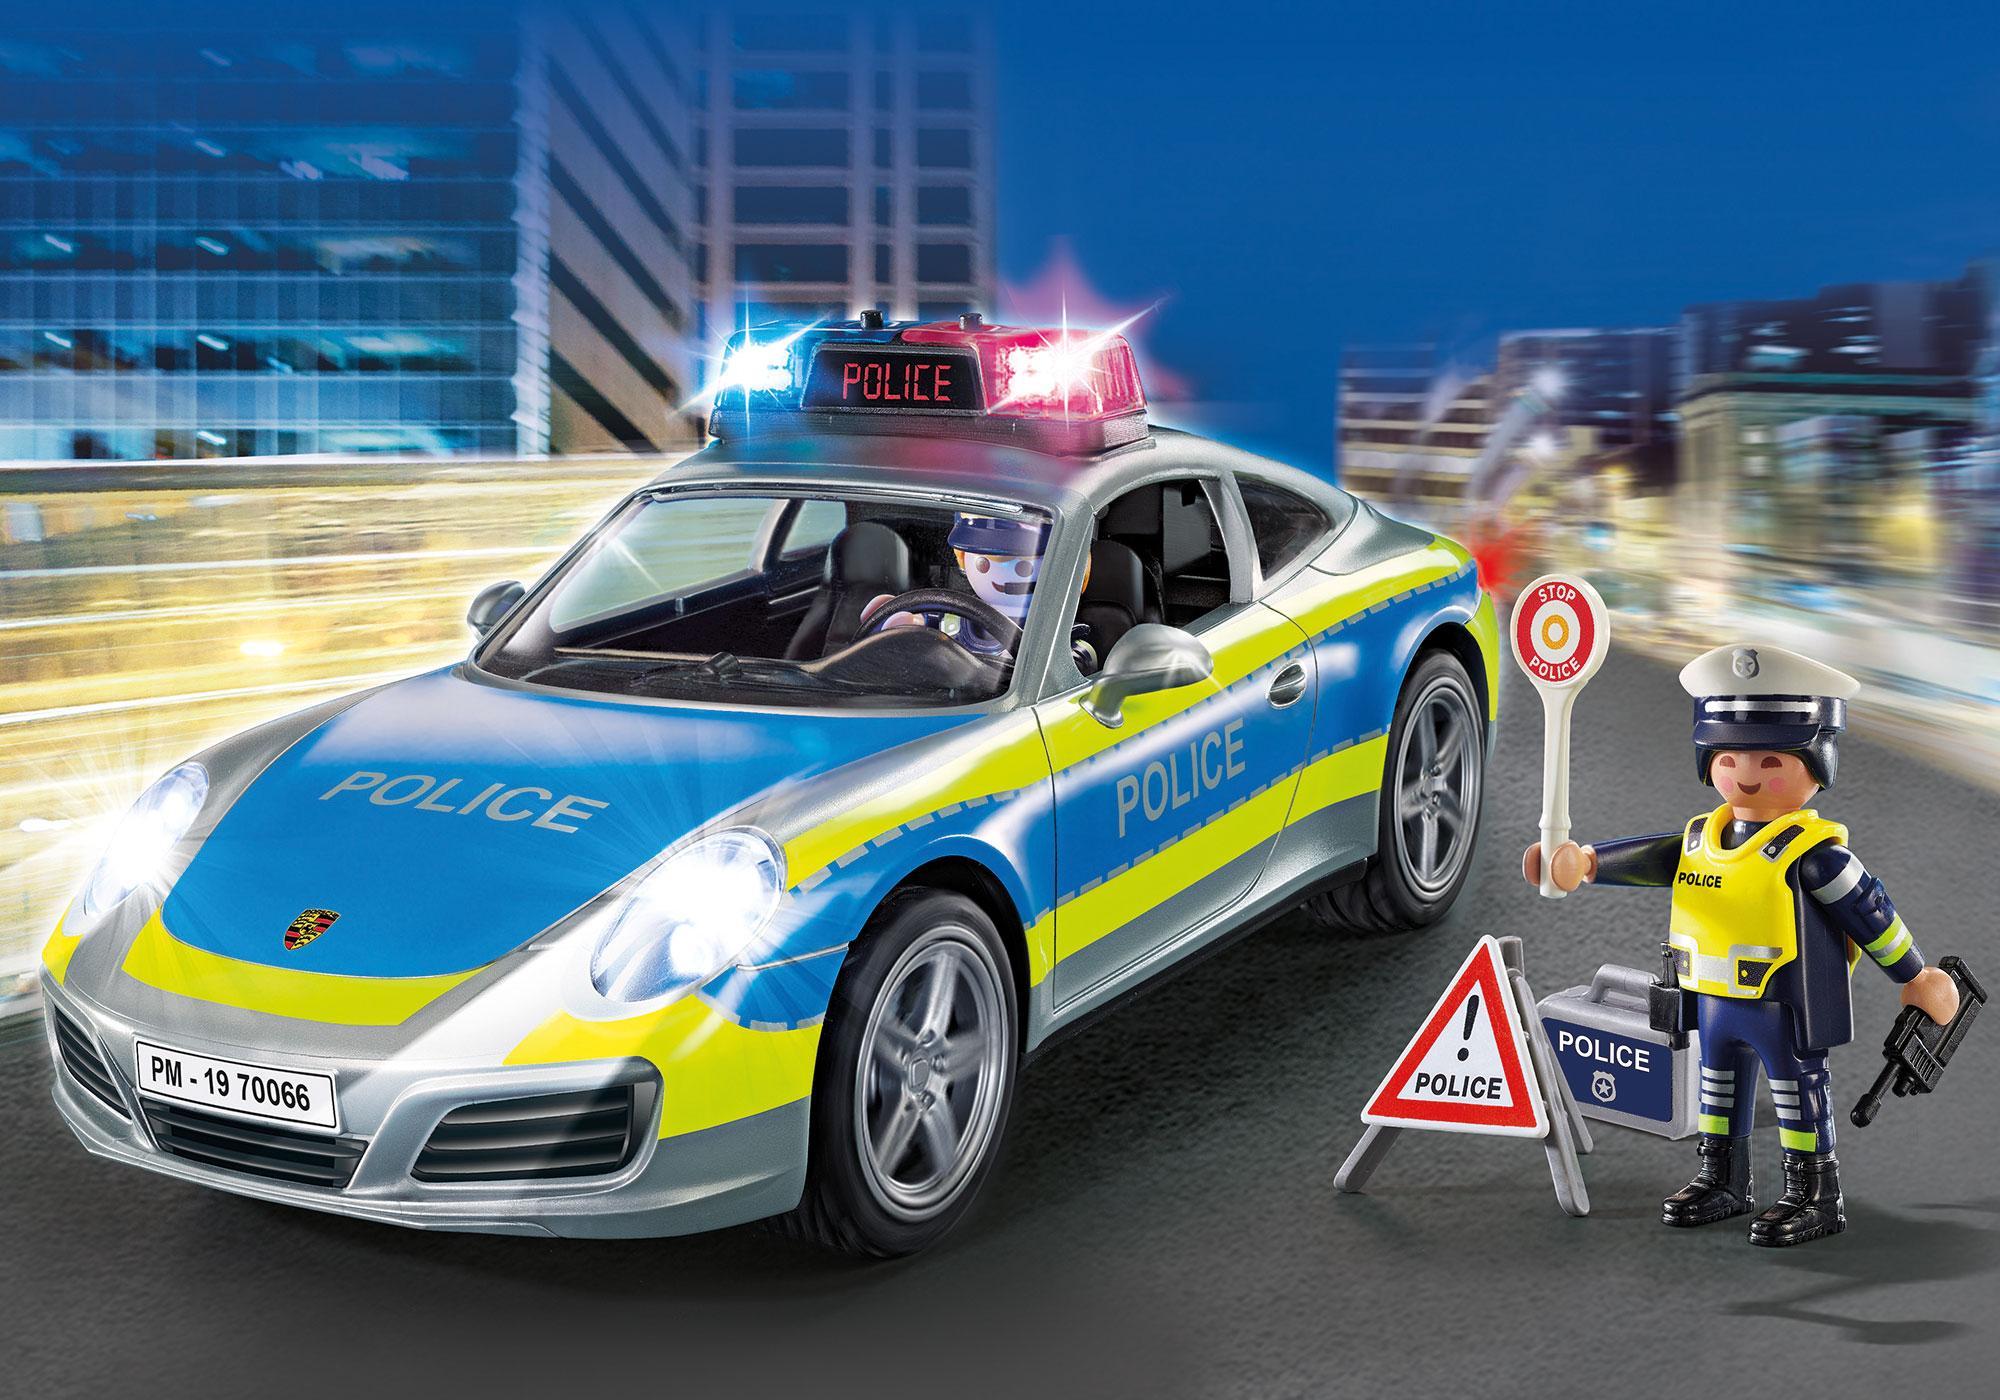 70066_product_detail/Porsche 911 Carrera 4S Politie